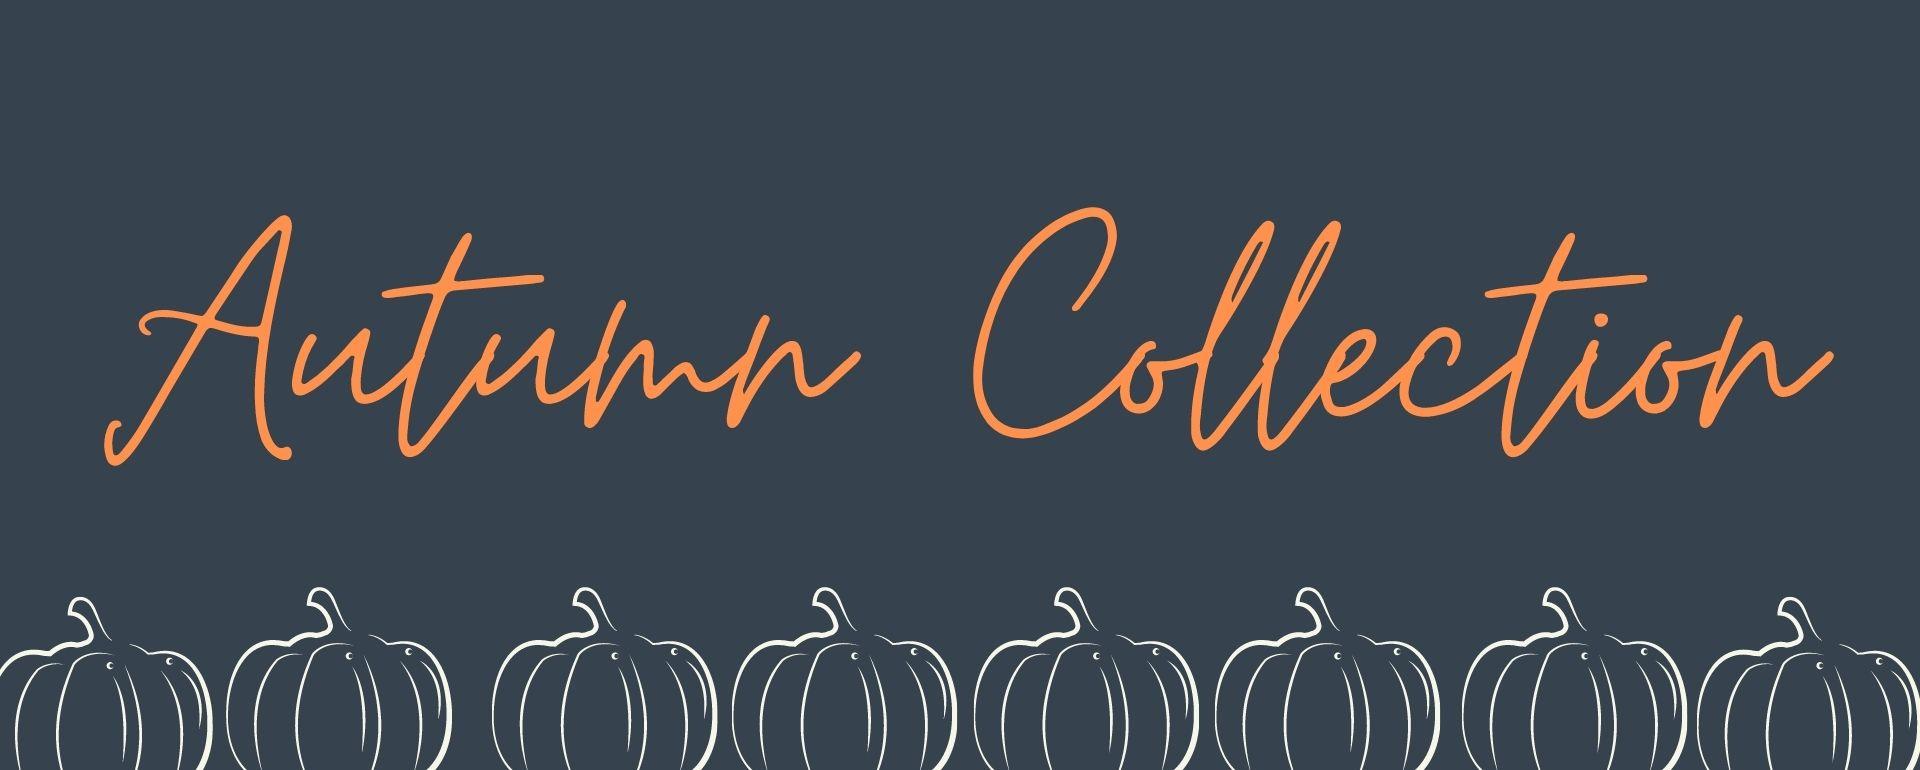 autumn-collection.jpg